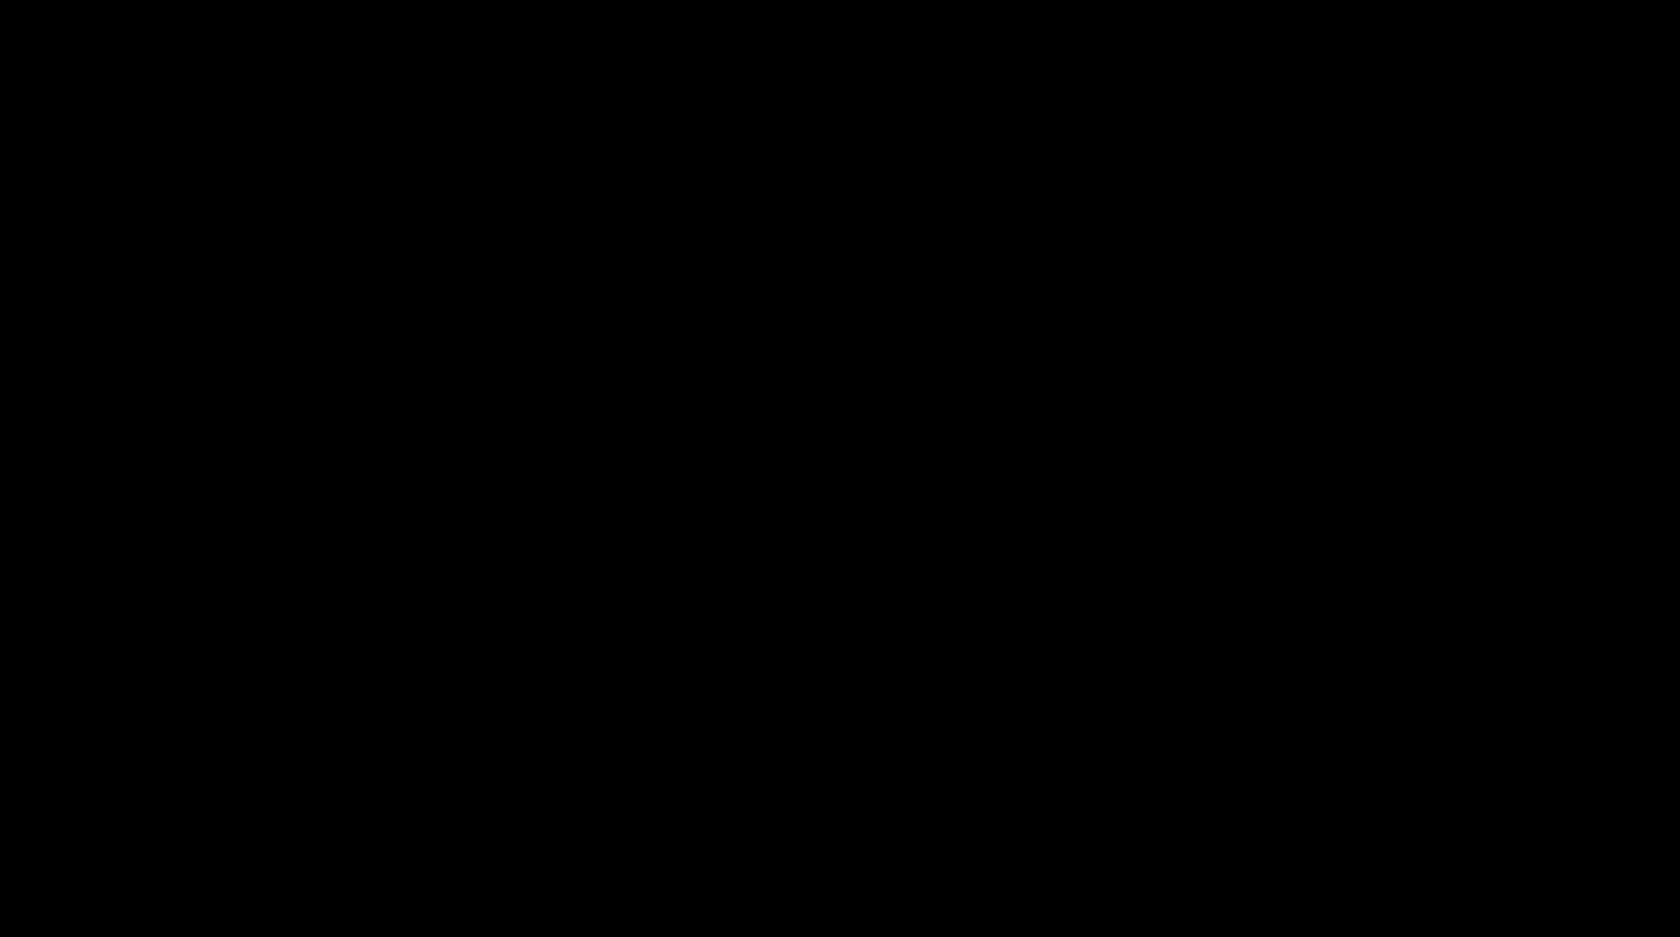 Yext_Seal_TM_Web_Black.png